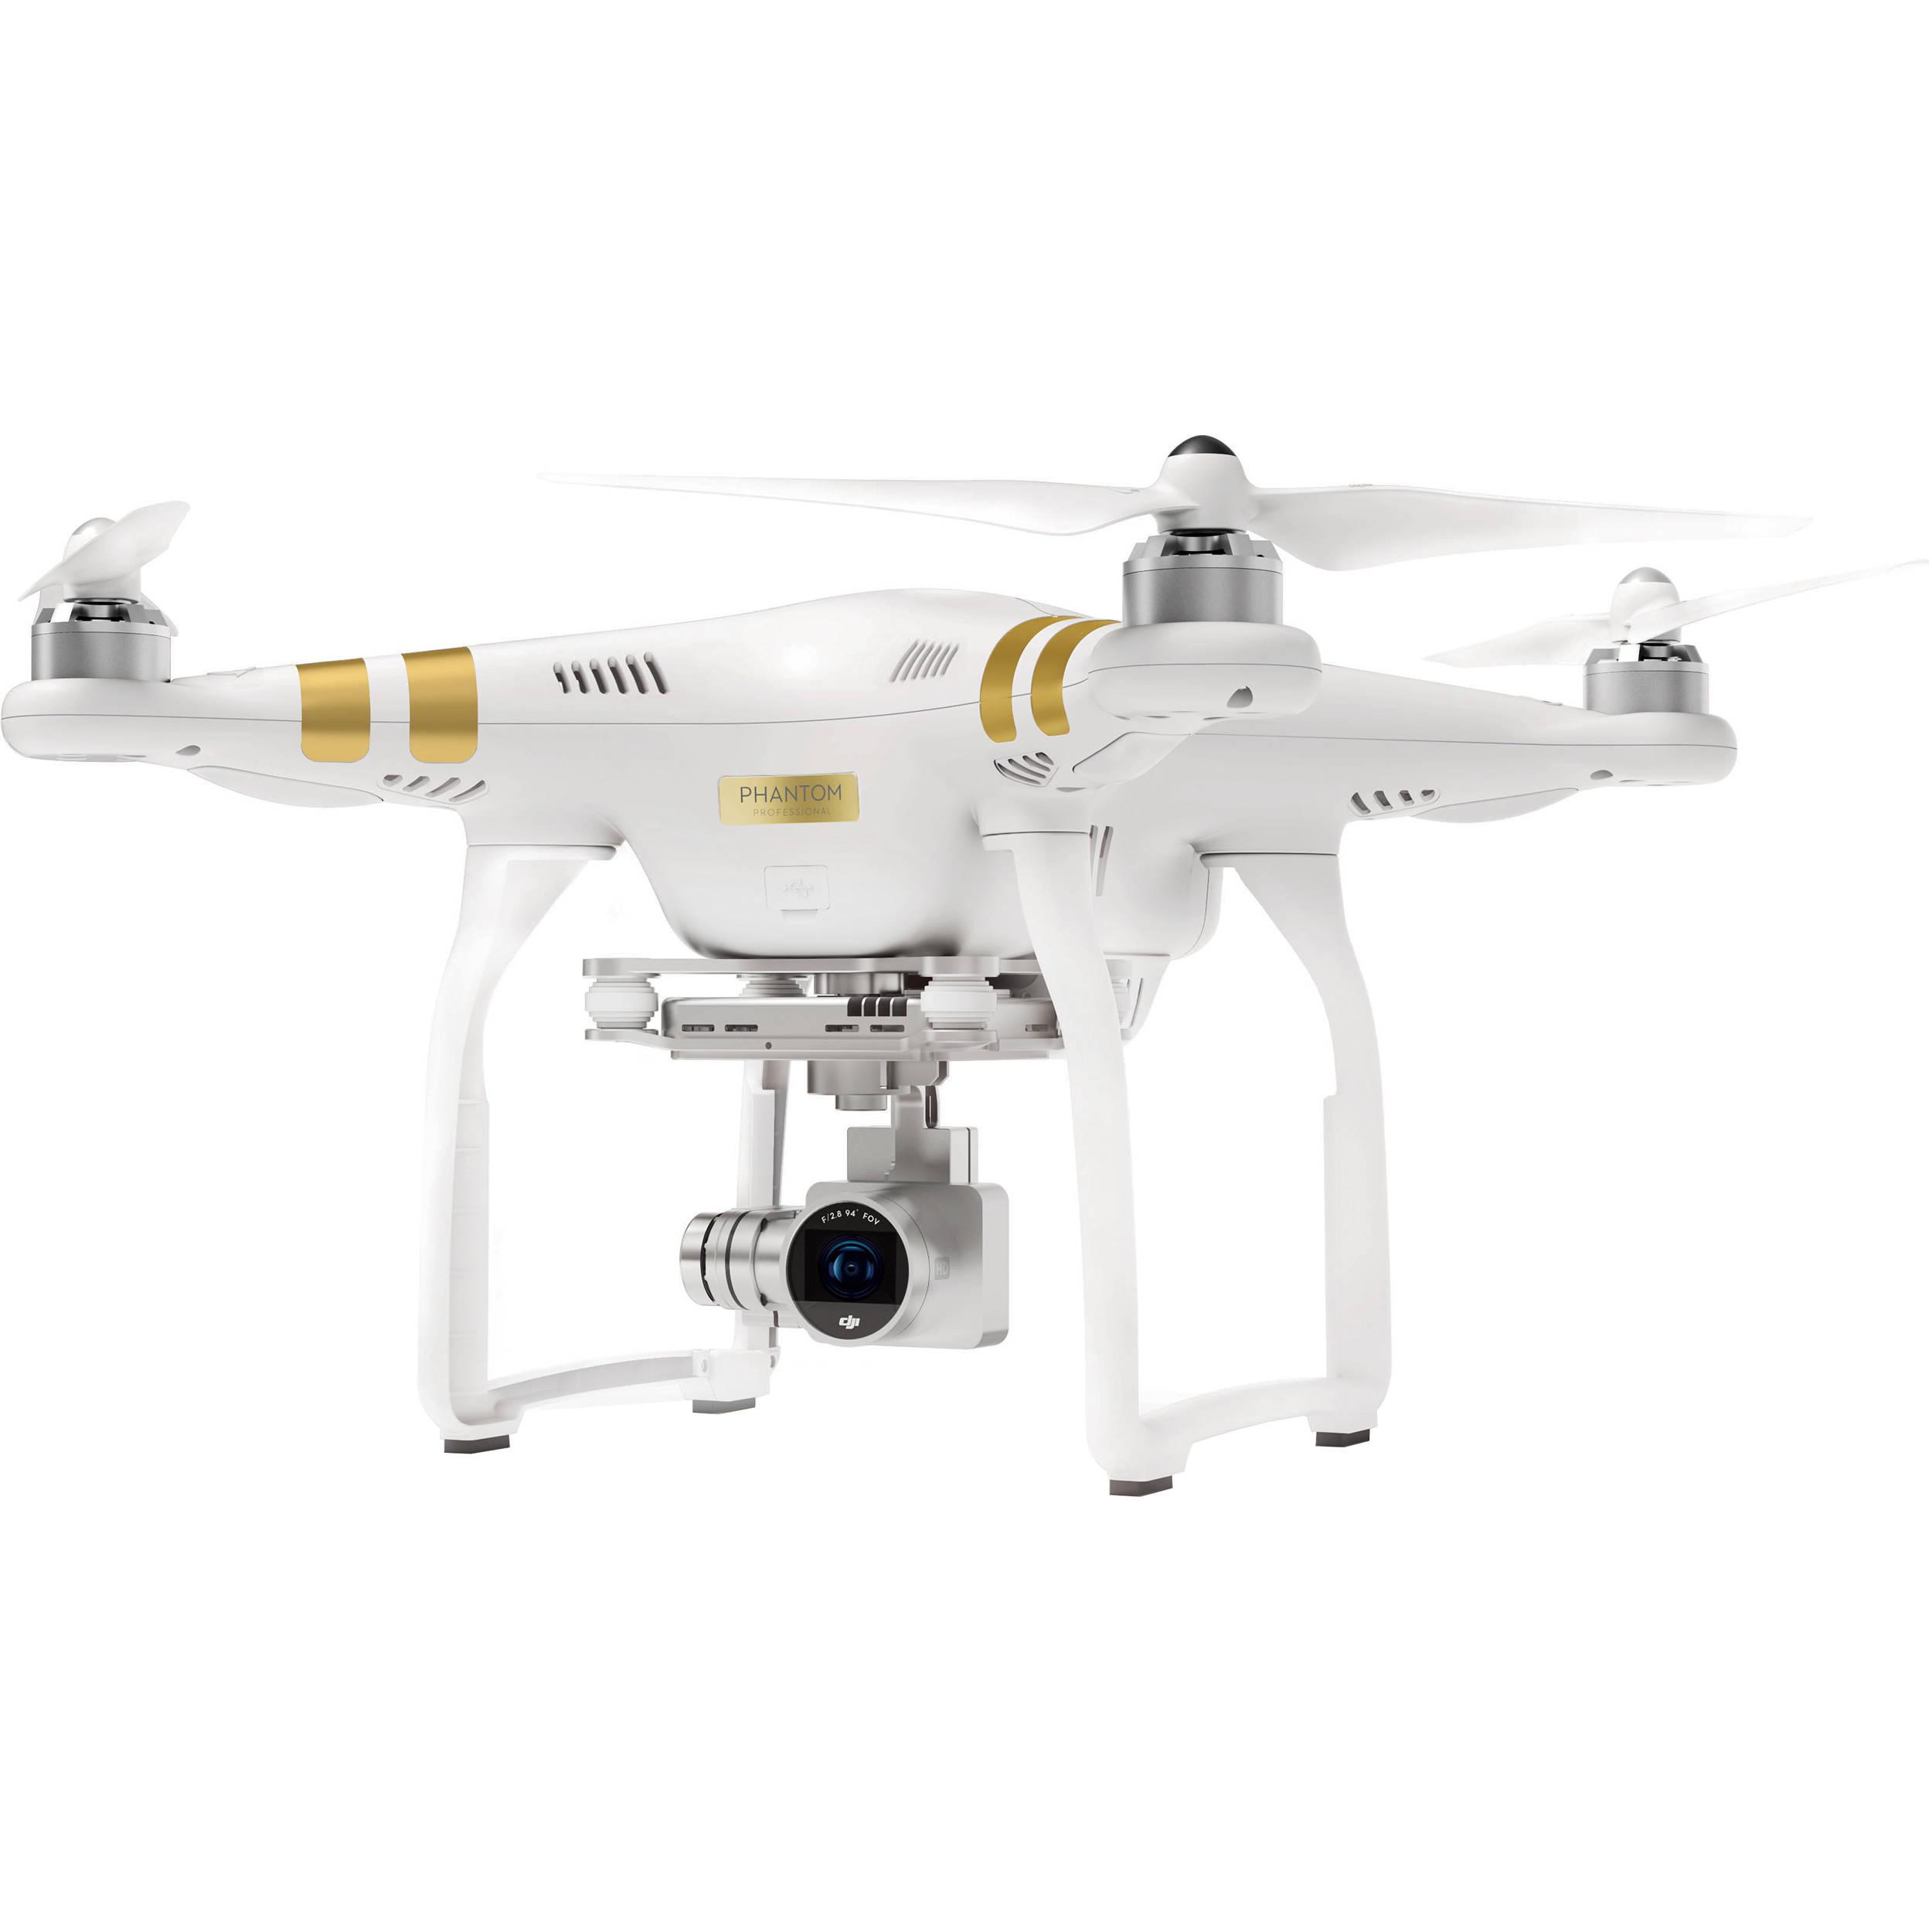 Dji Phantom 3 Drone >> Used Dji Phantom 3 Professional Quadcopter With 4k Cp Pt 000181